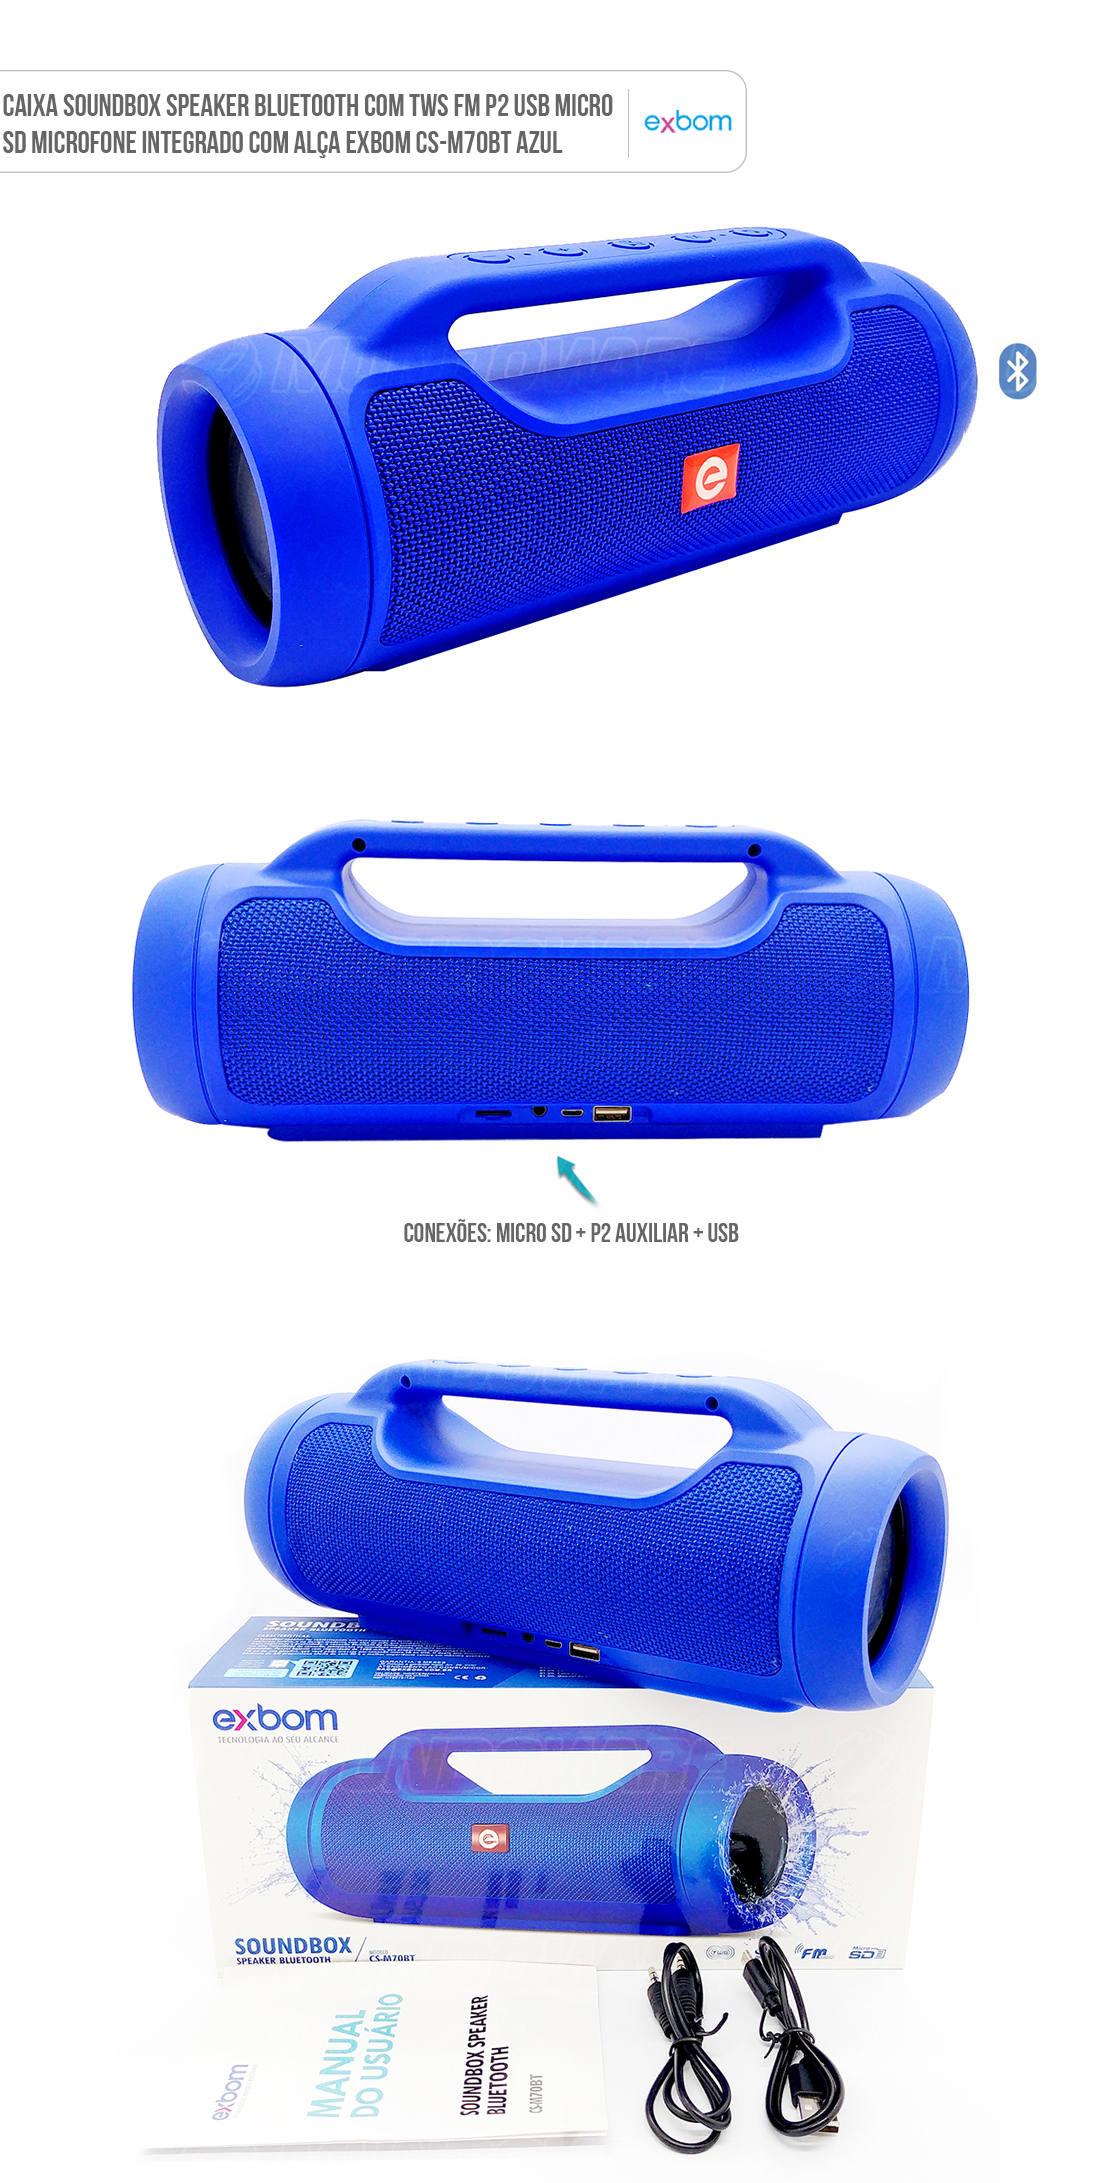 Caixa Portátil Soundbox Speaker Bluetooth com TWS FM P2 USB Micro SD Microfone